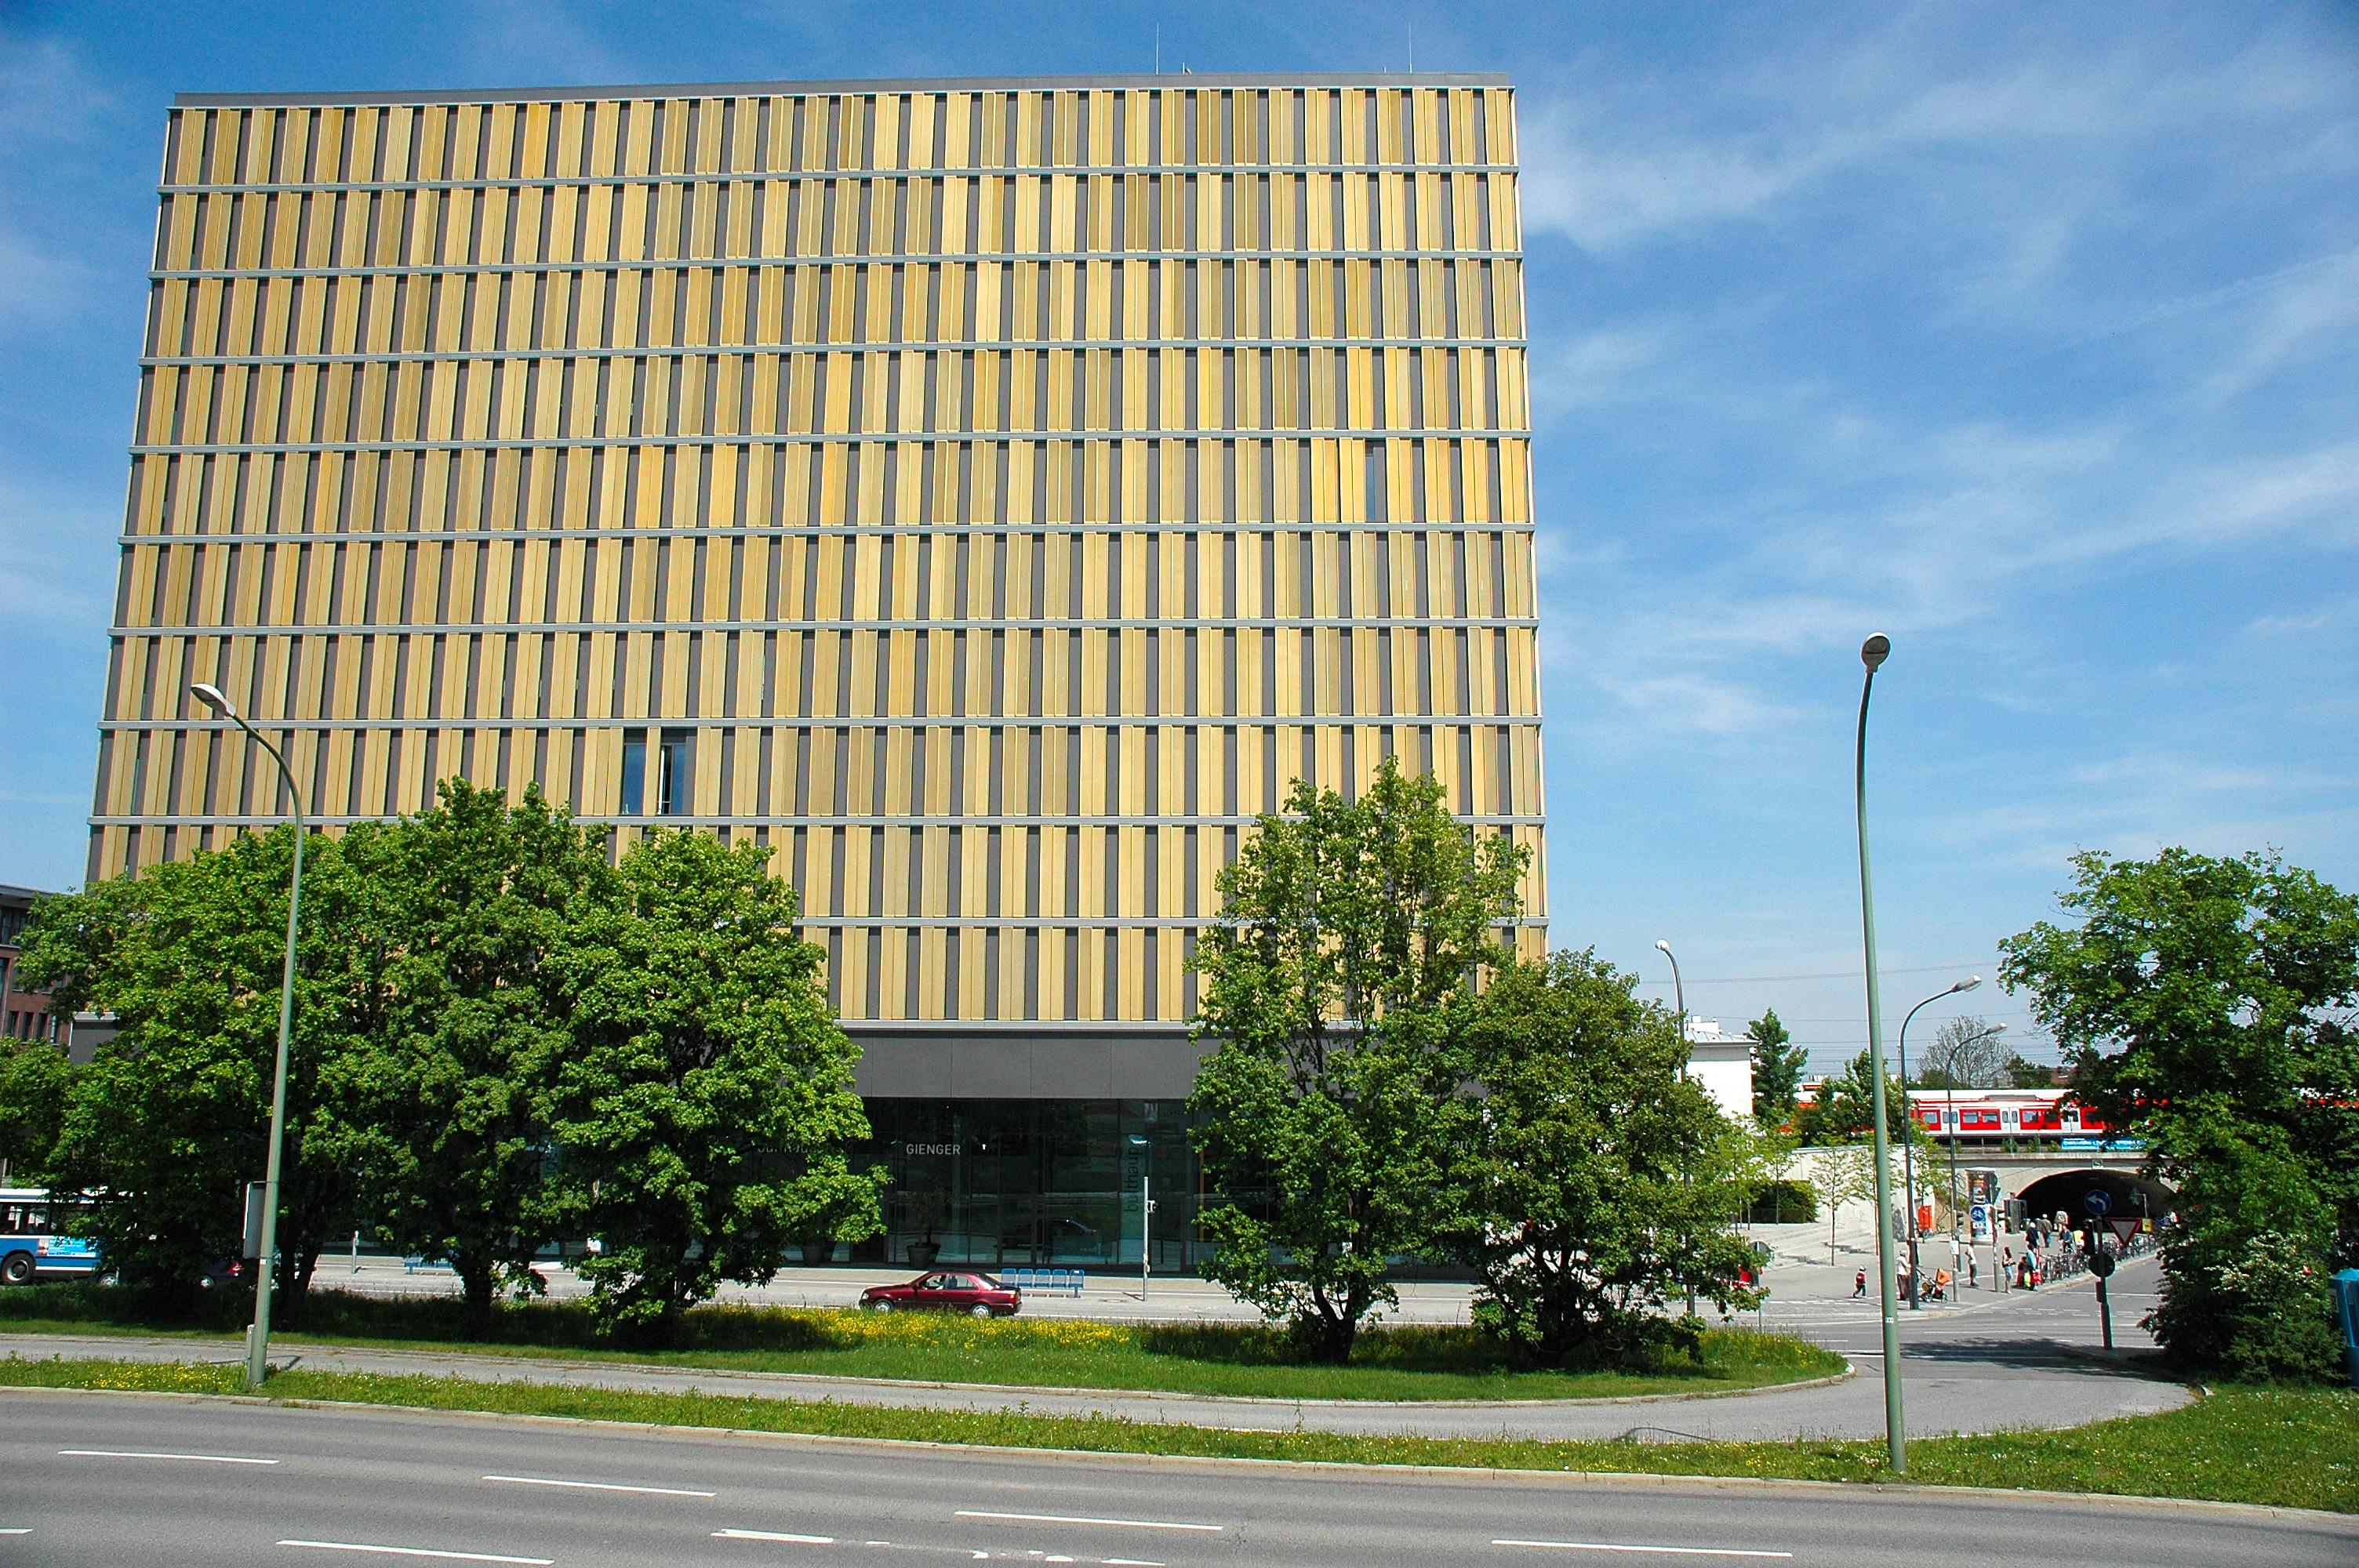 File:Laimer Würfel   Laim   München   Moderne Architektur.JPG